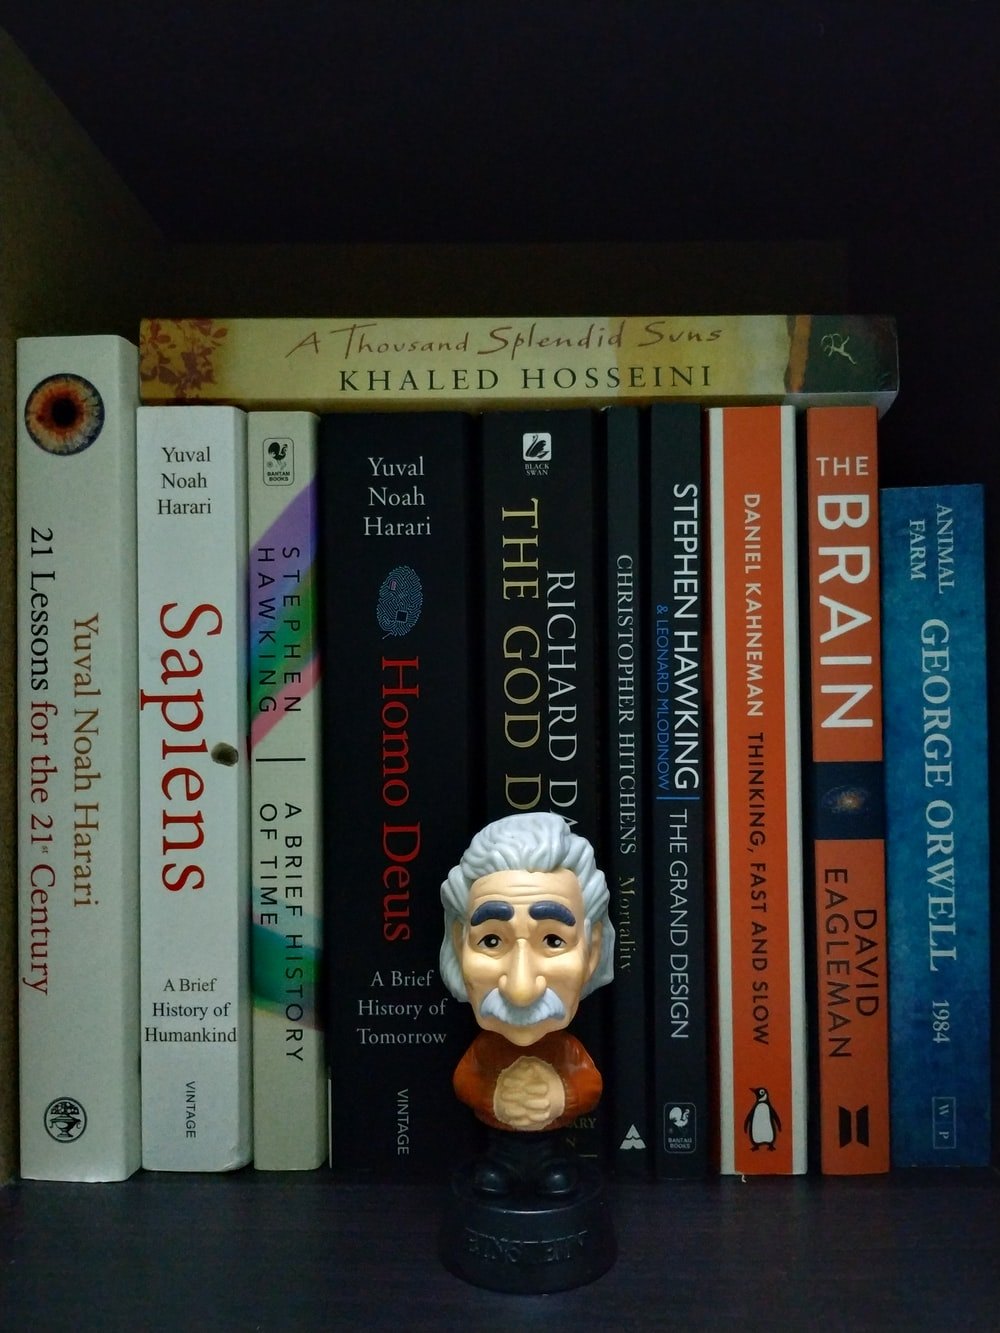 Albert Einstein mini figure besides books